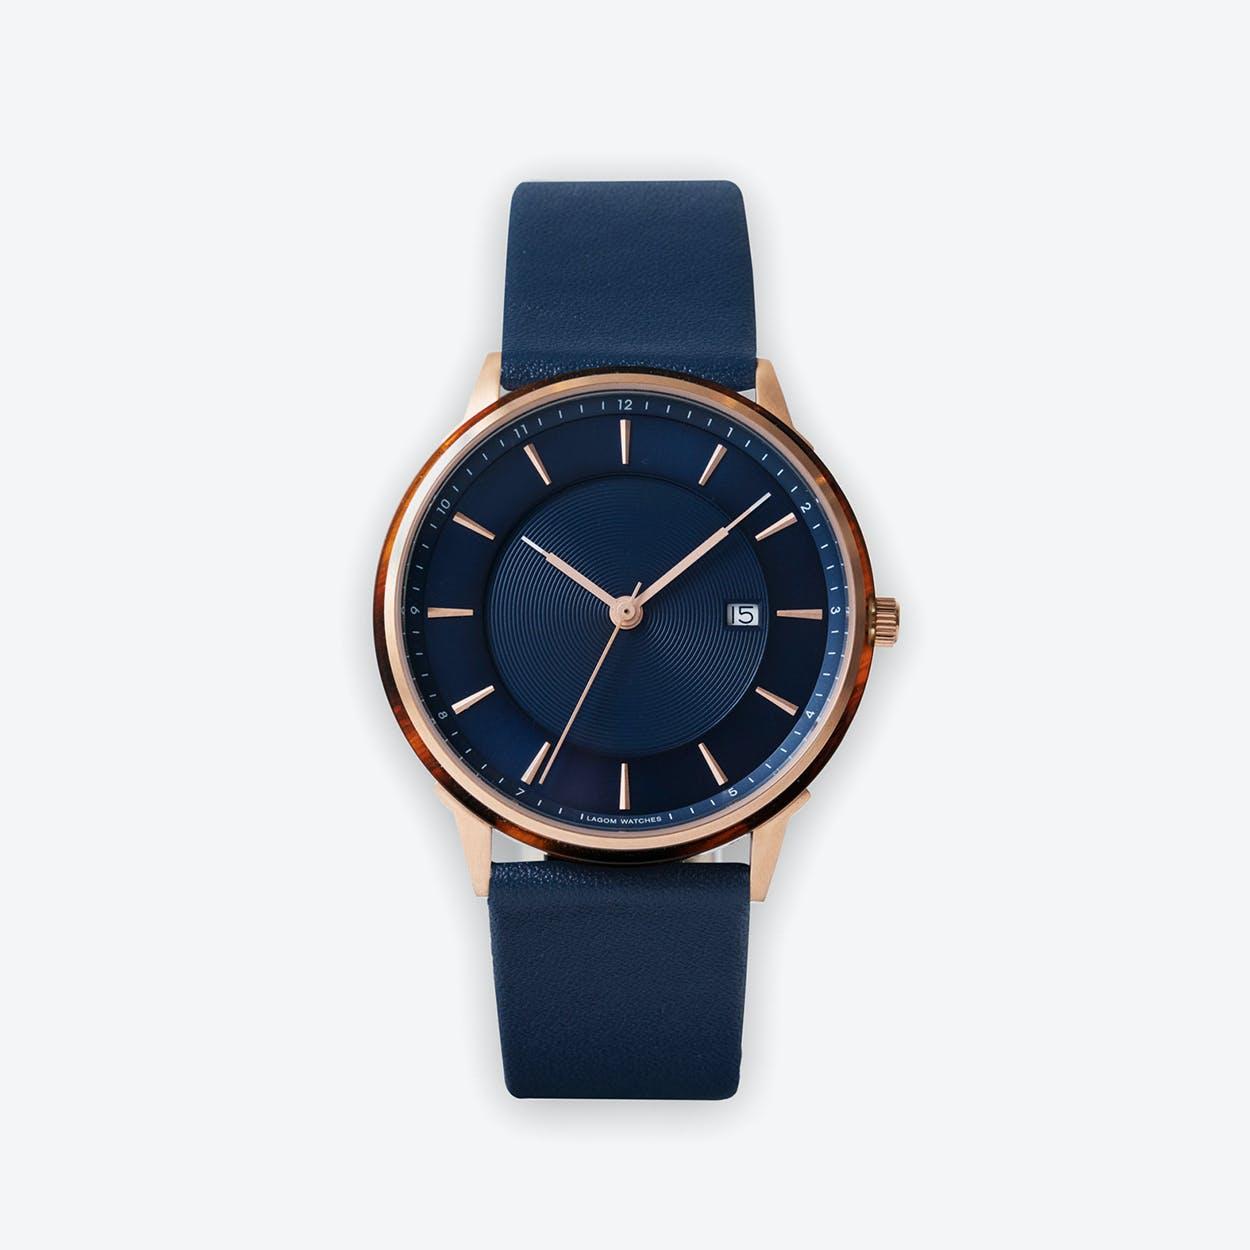 BÖRJA - Rose Gold Watch in Dark Blue Face & Navy Leather Strap